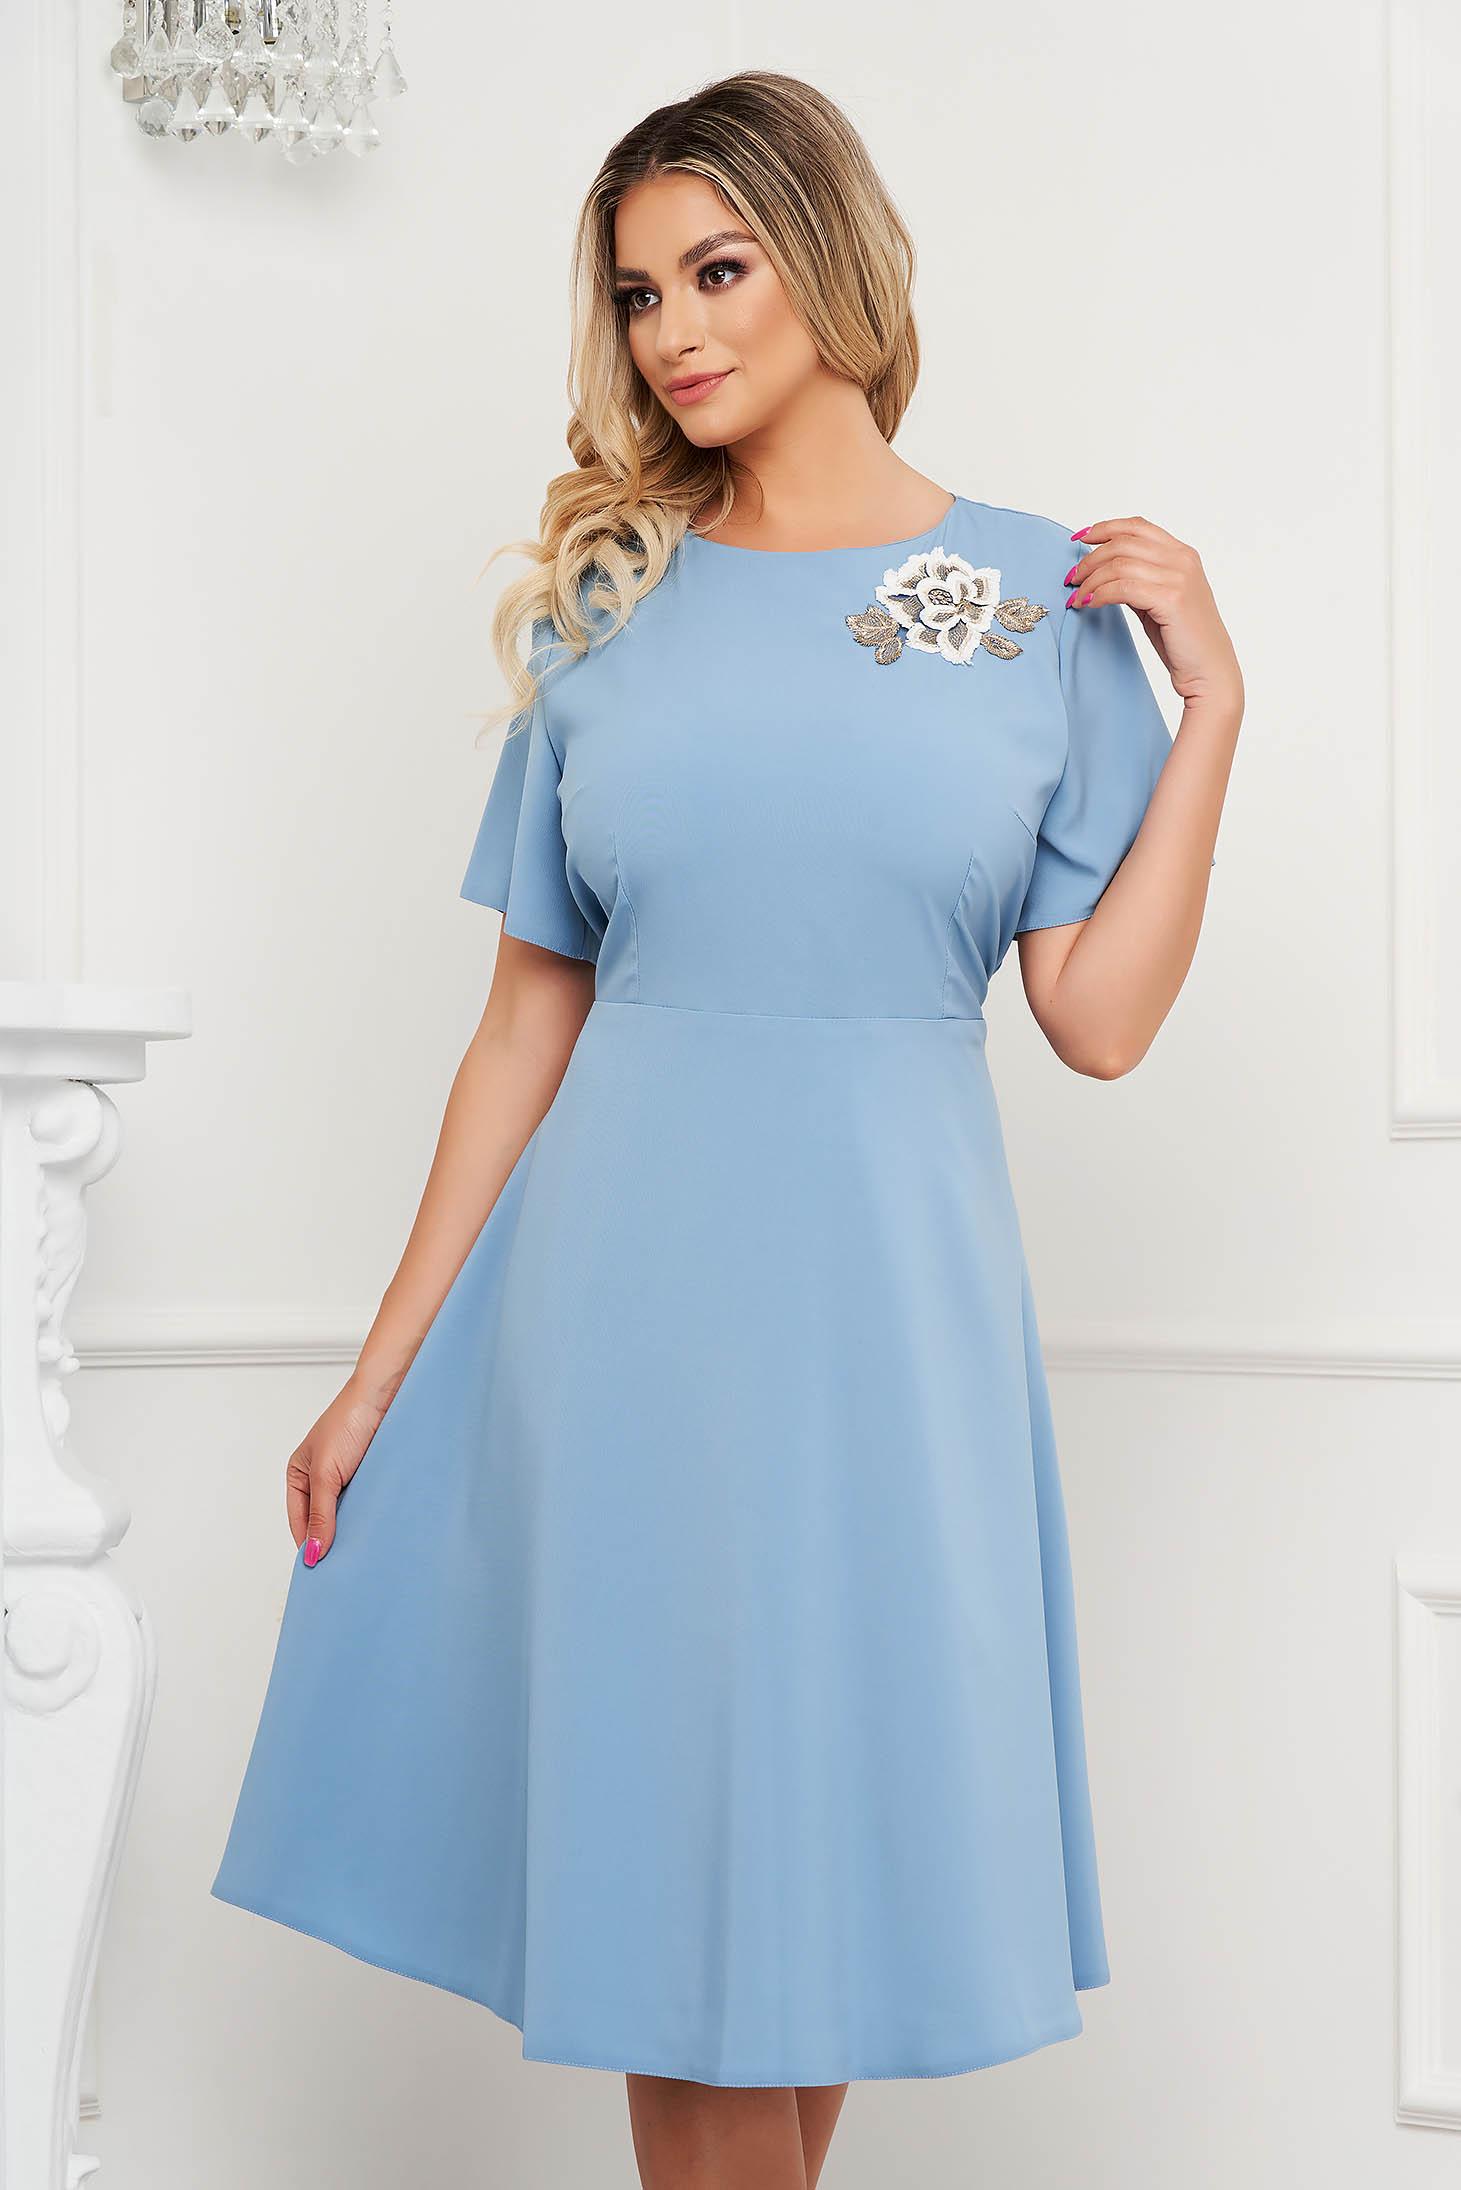 Rochie Lady Pandora albastru-deschis de ocazie cu croi in a si broderie florala